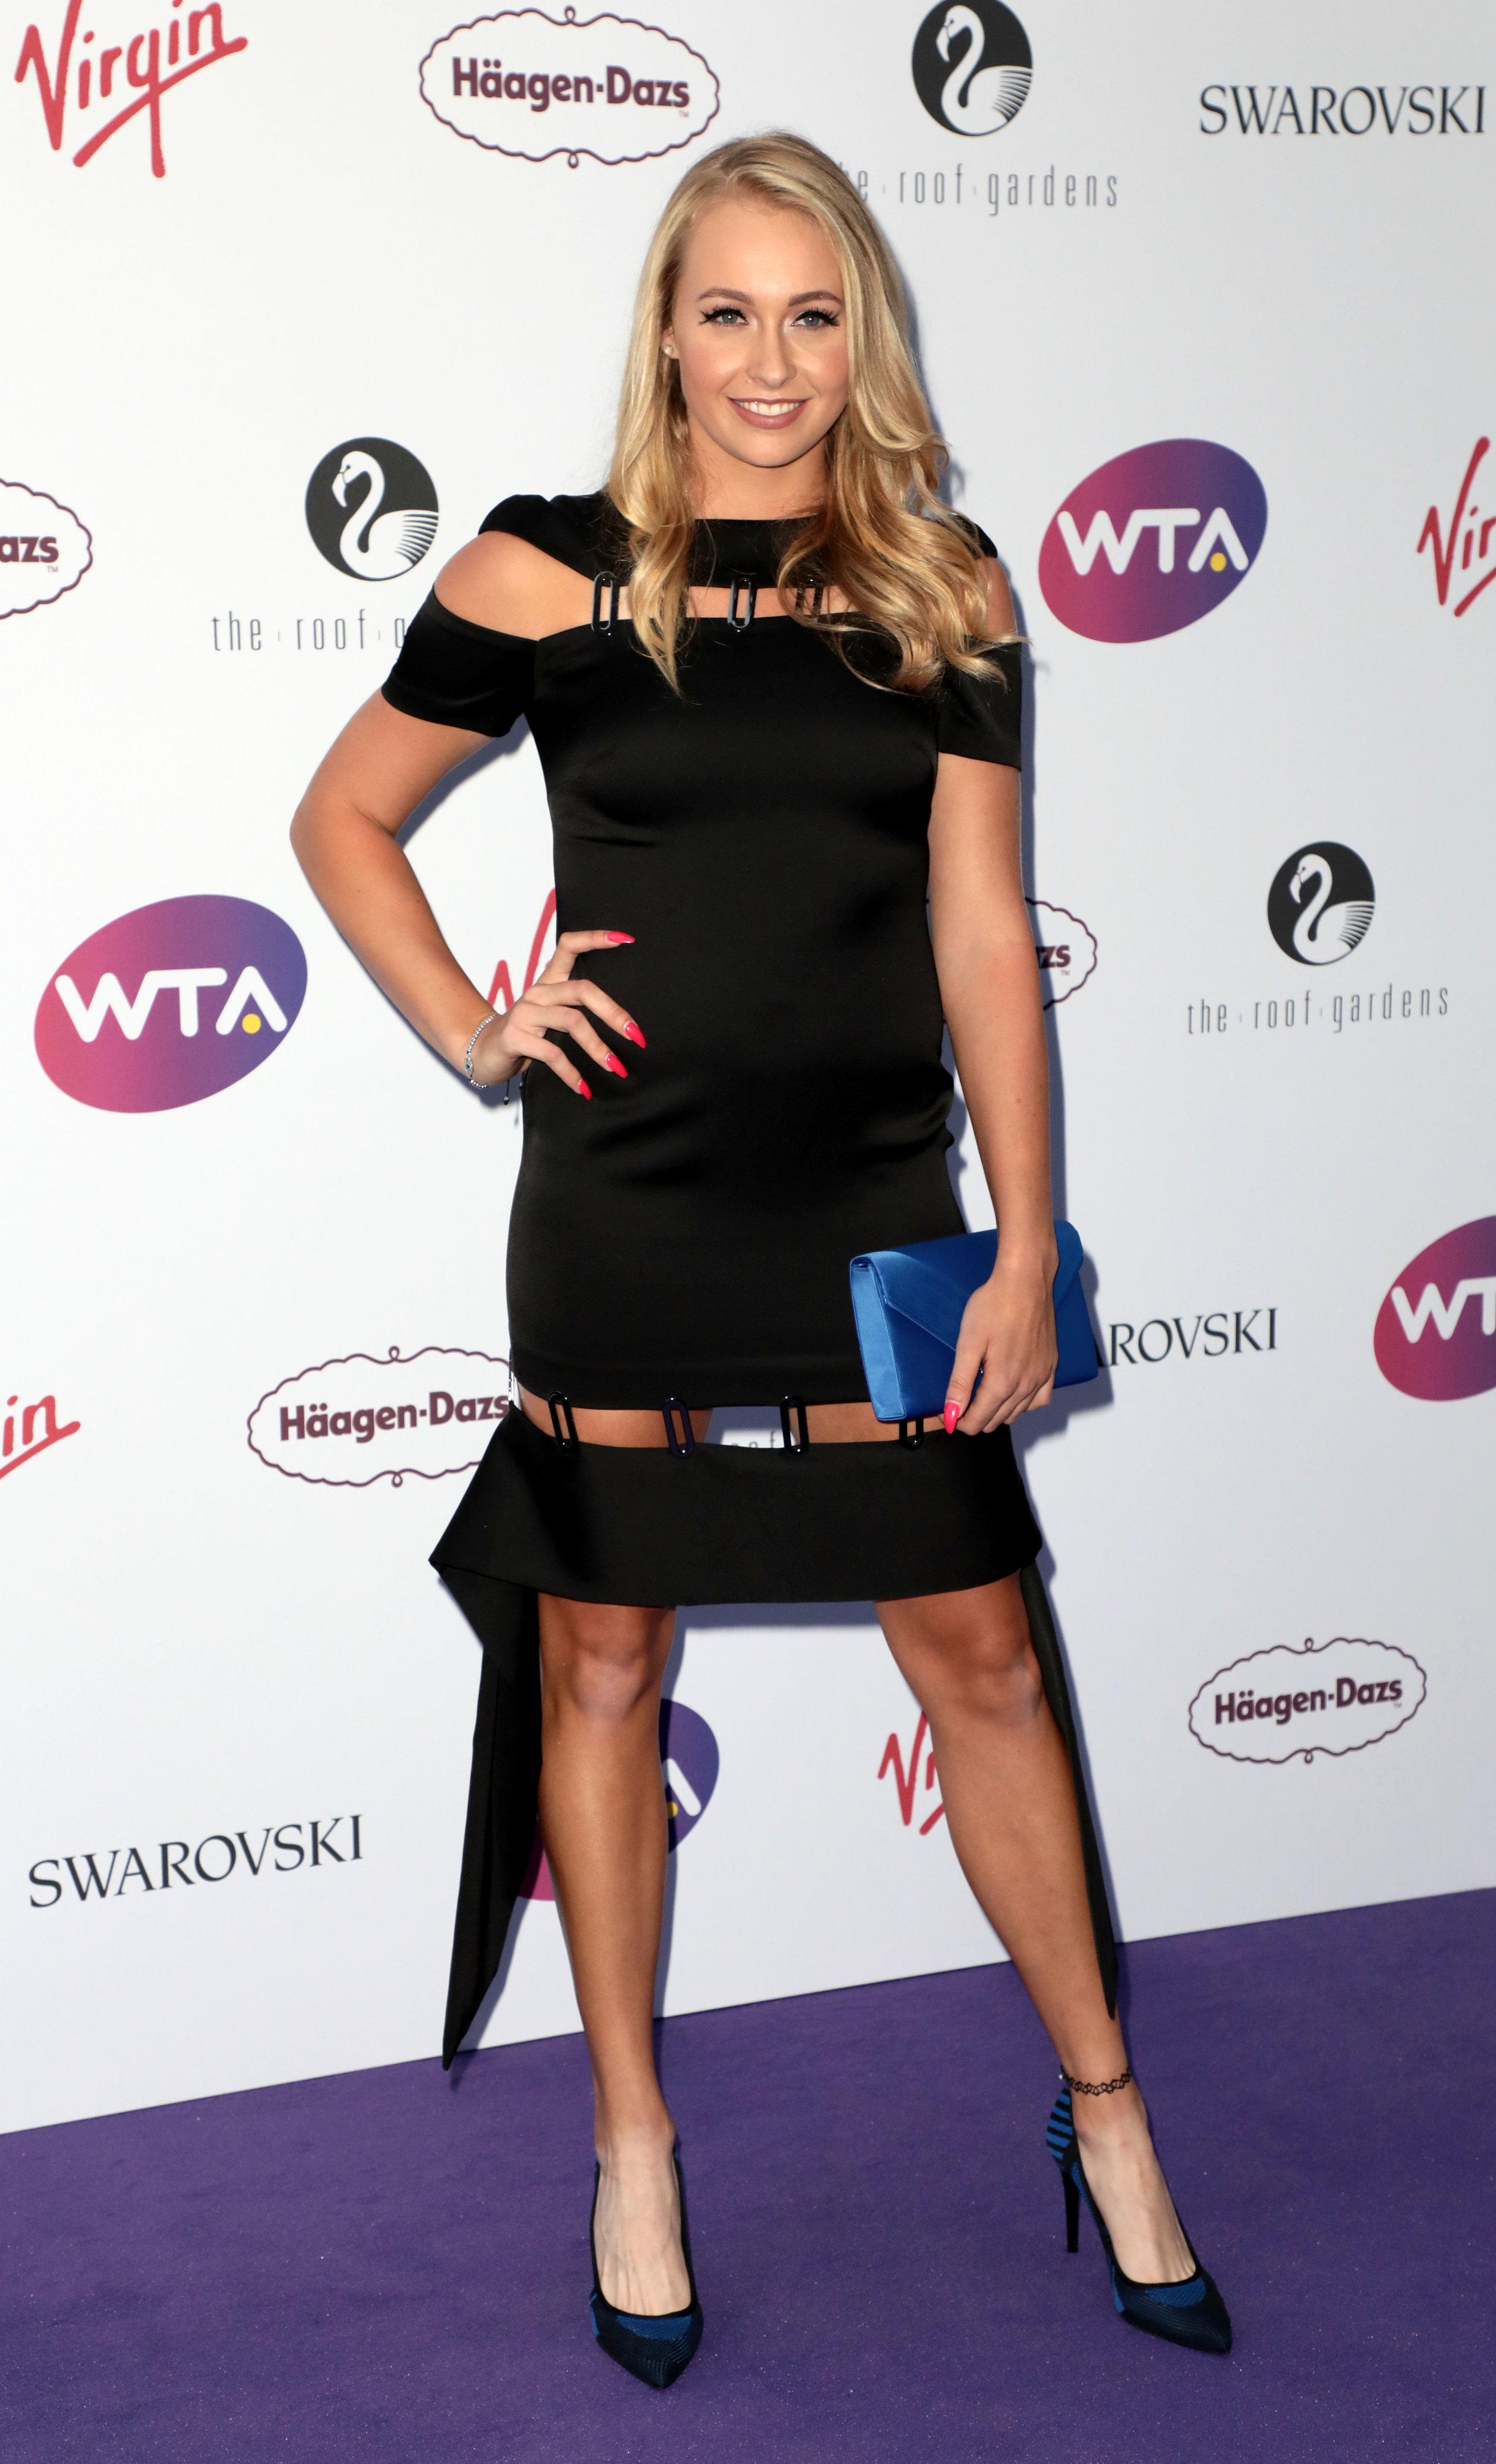 PHT_B5327_WTA_Pre_Wimbledon_Party_13916.JPG